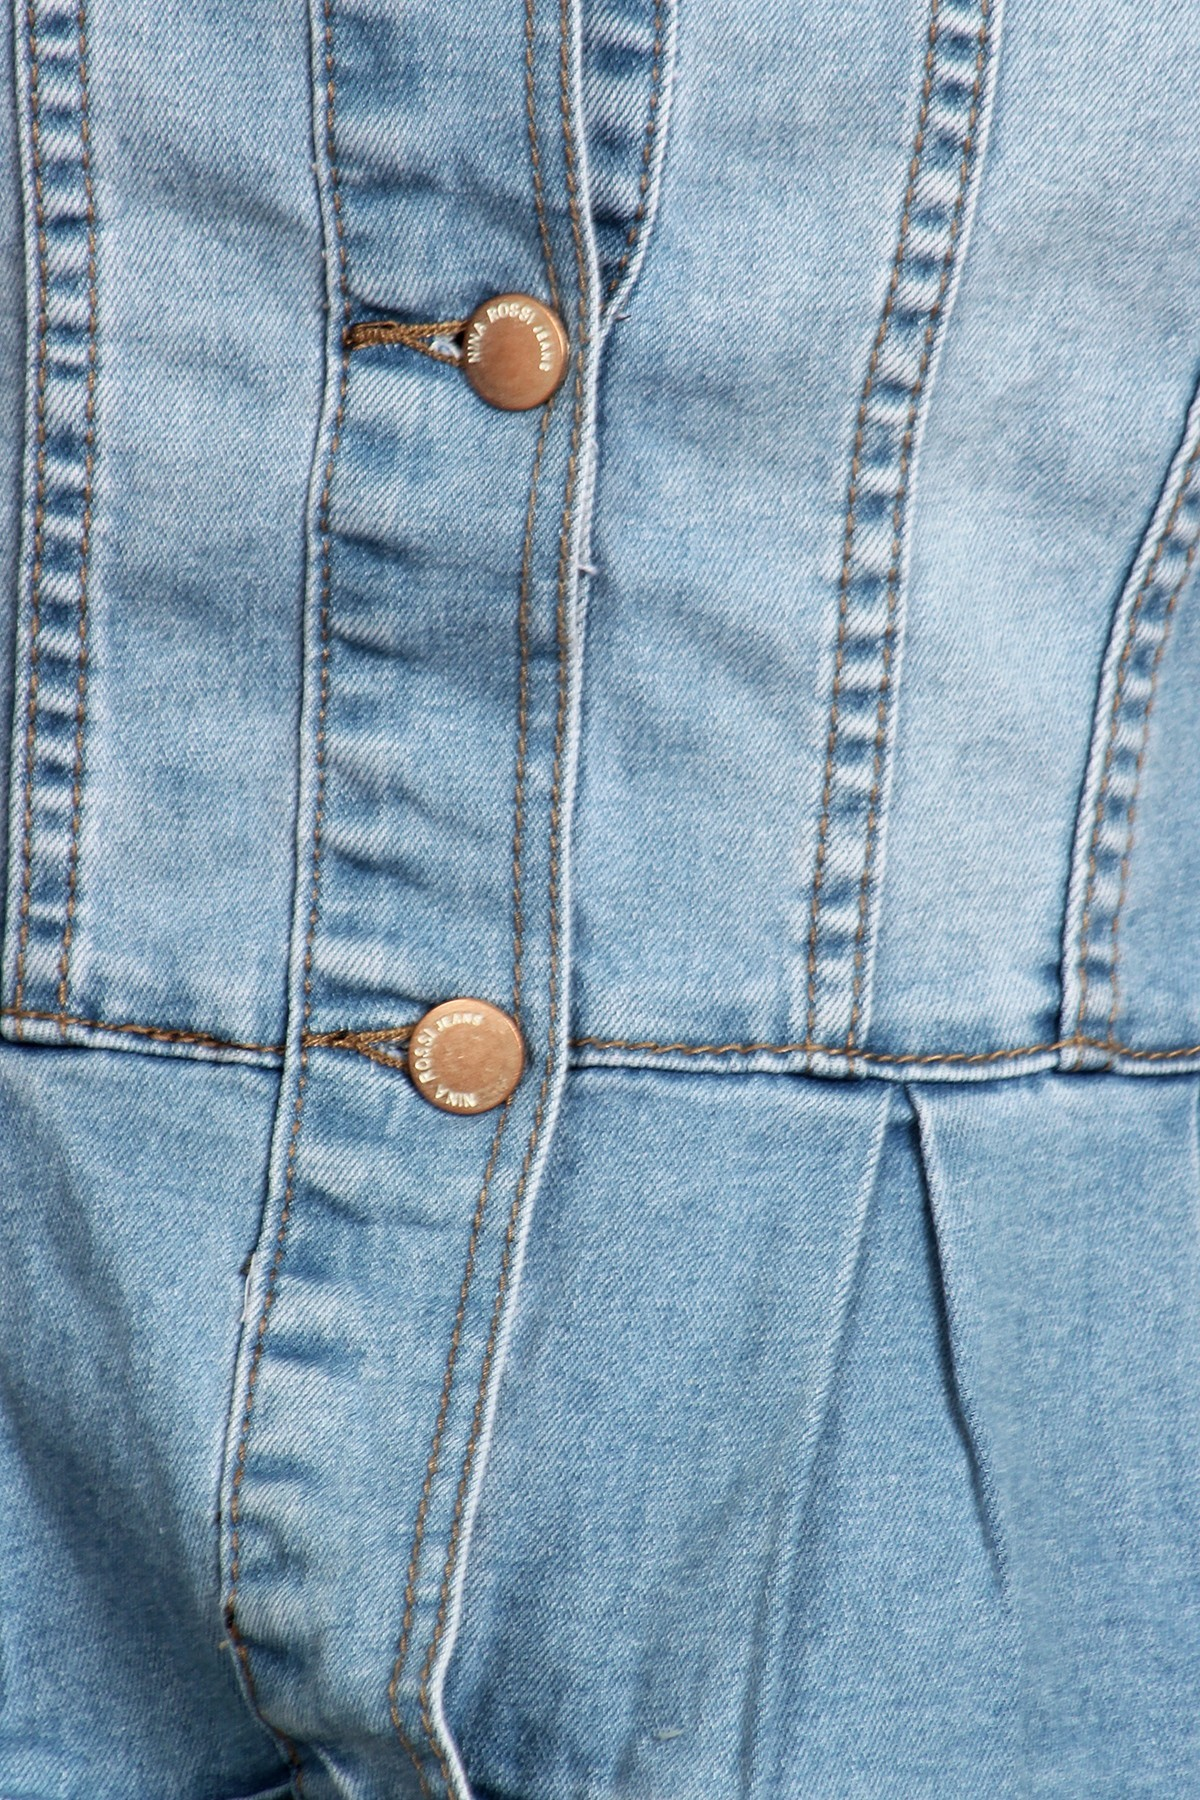 Women-039-s-Juniors-Premium-Denim-Peplum-Bodice-Long-Sleeve-Jacket thumbnail 17